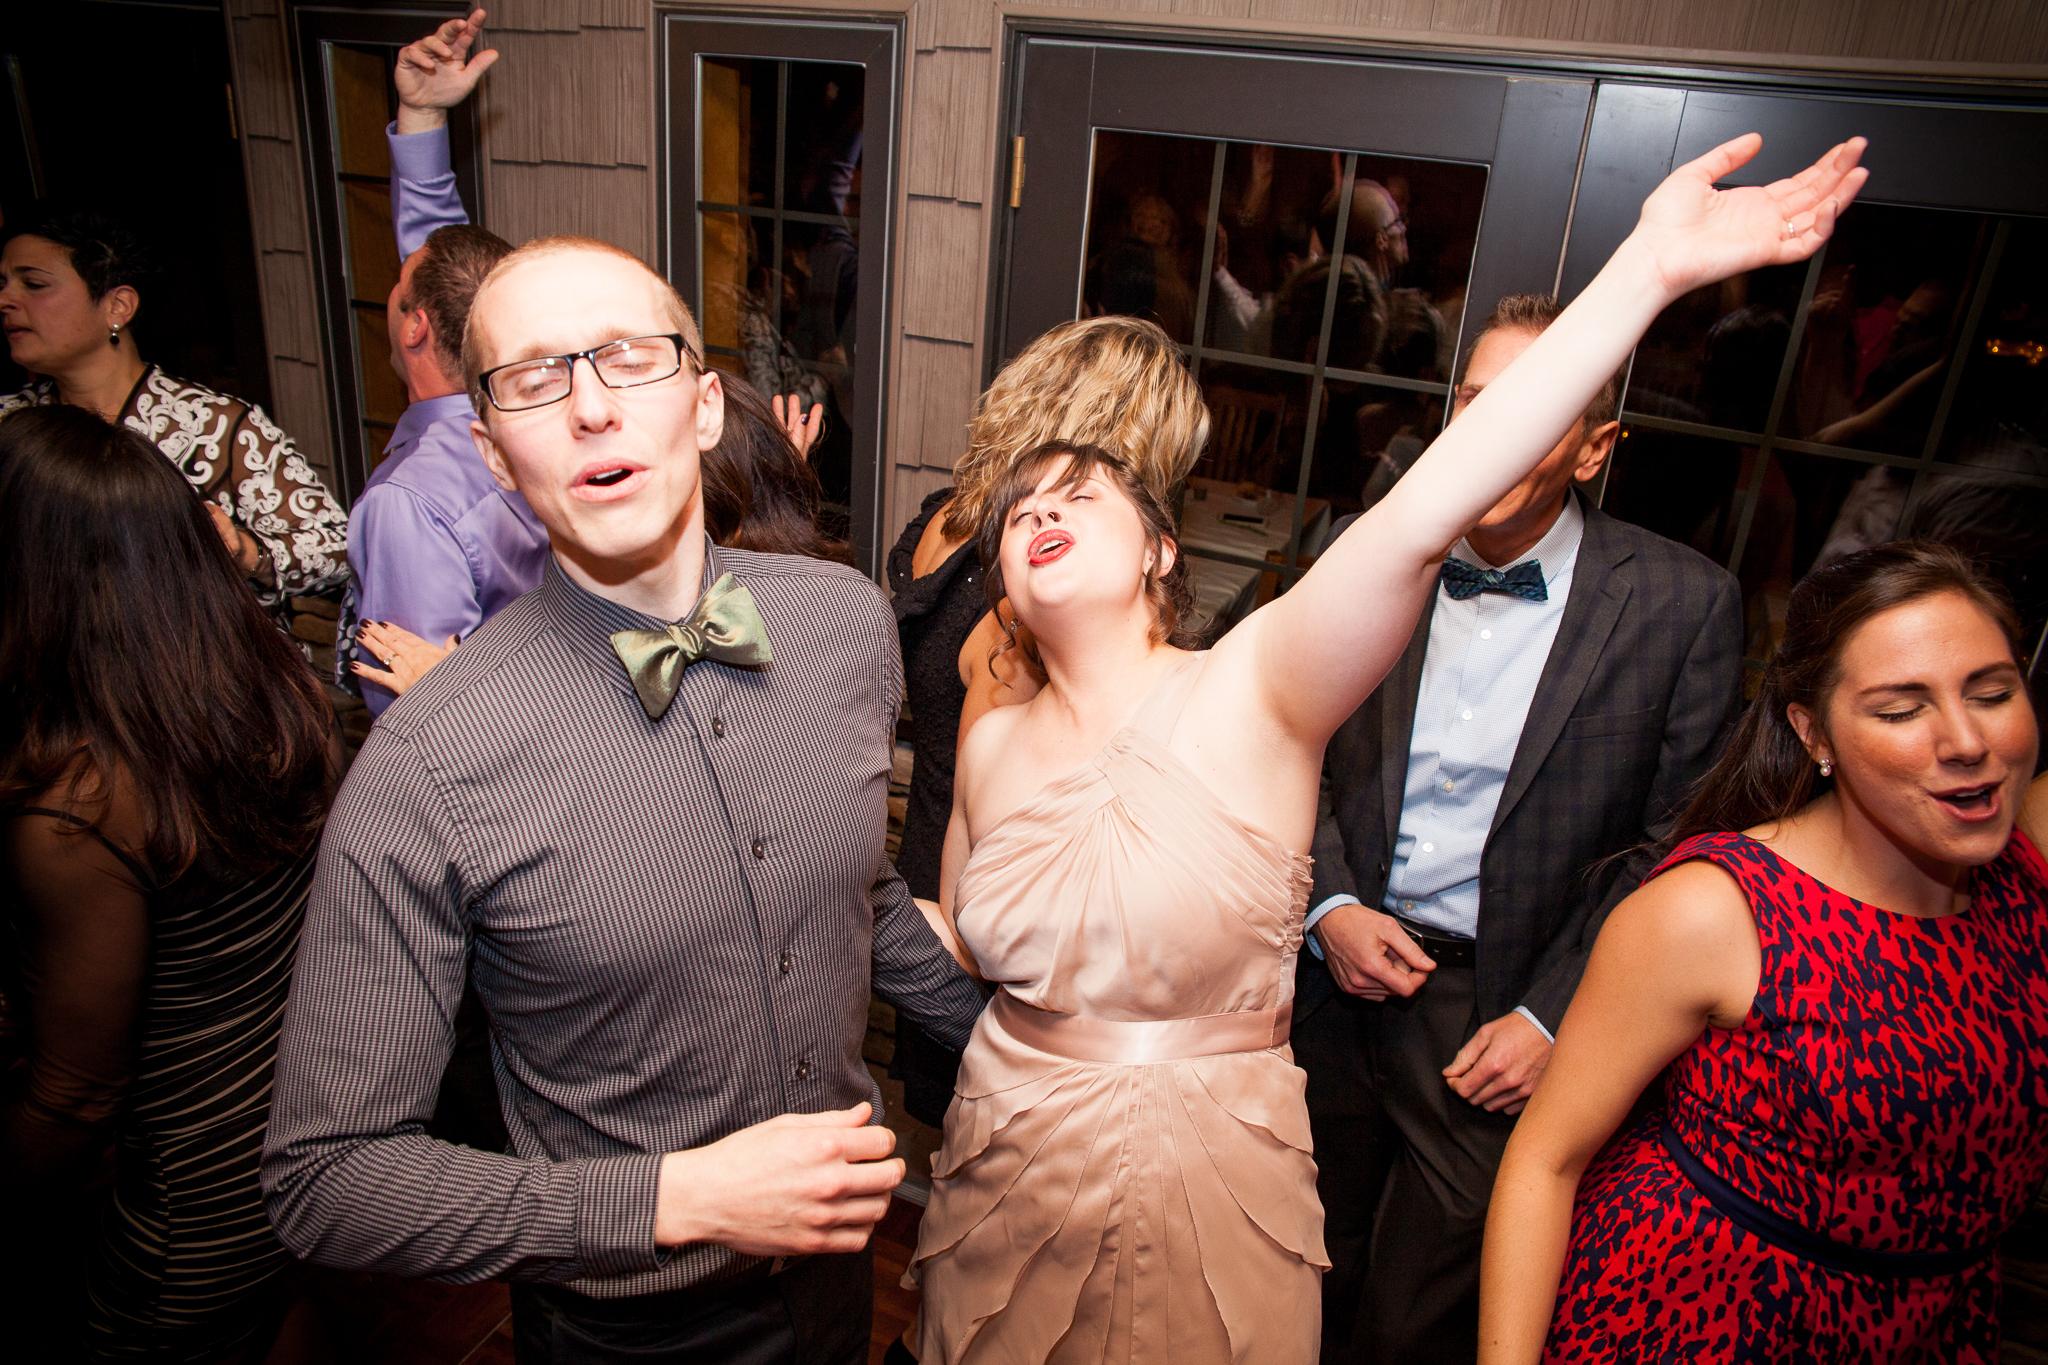 camuglia-whomstudio-chelsea_and_andy-nycphotographer-wedding-brooklyn-buffalo-timberlodge-154-0979.jpg